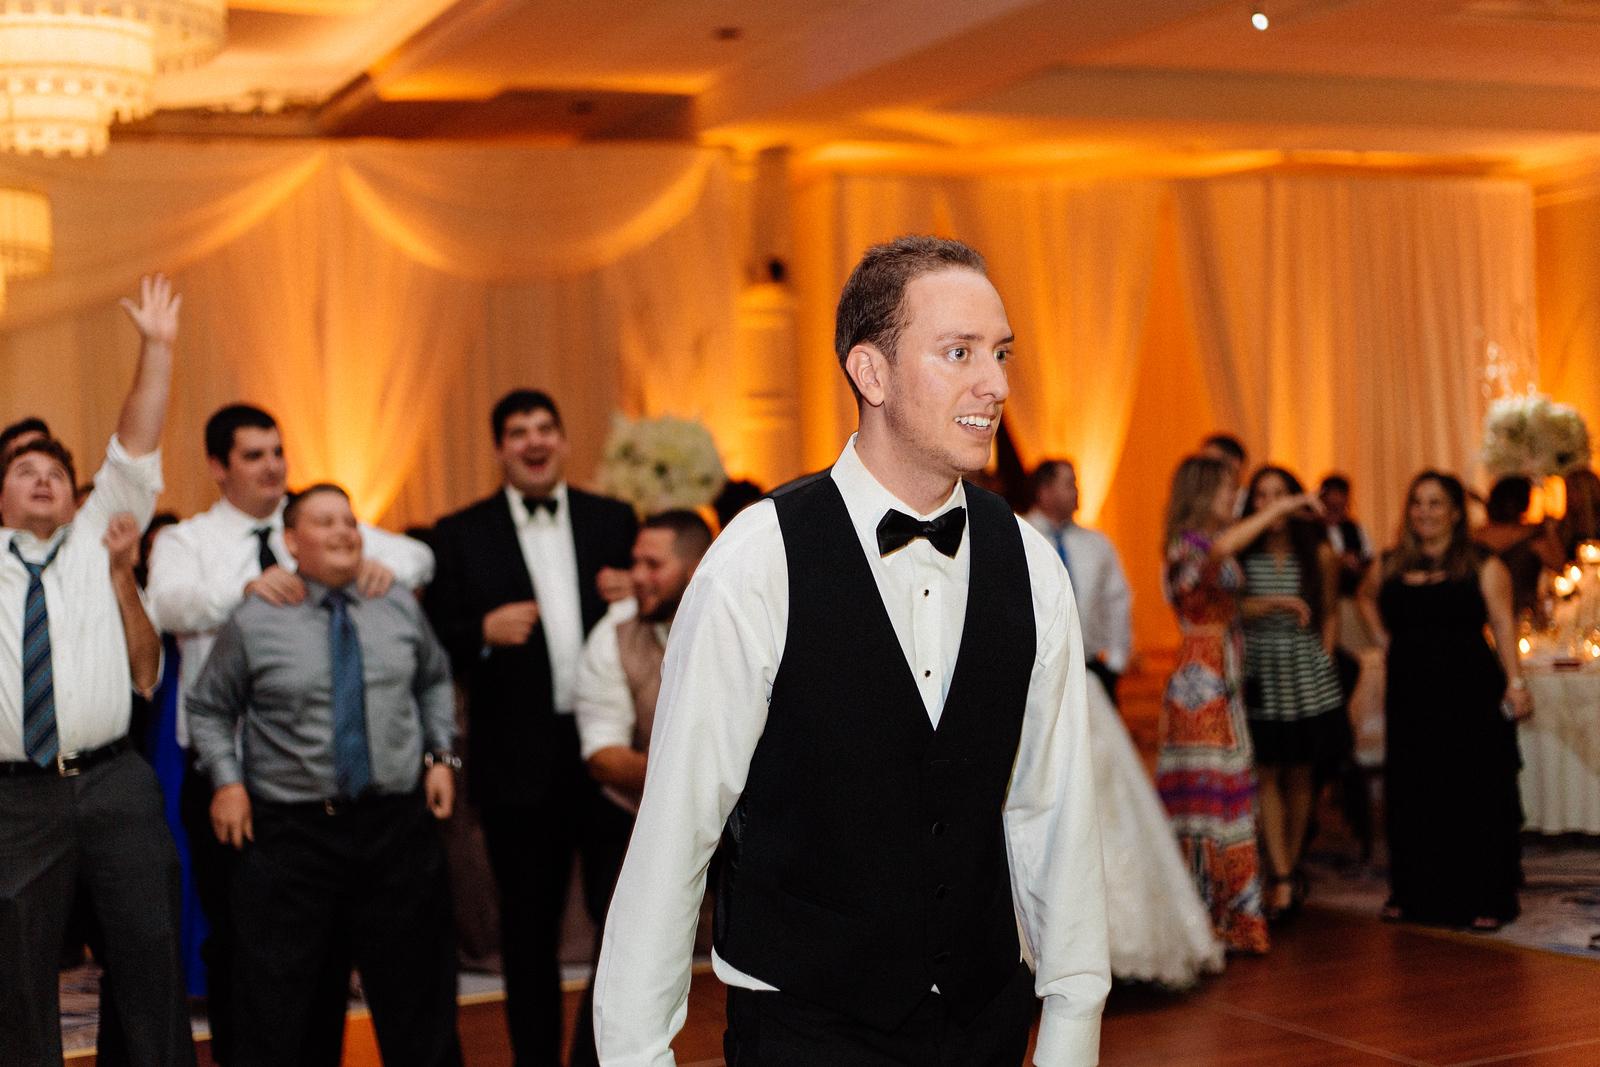 South-Florida-Wedding-Photographer-Andreo-5D3_5432